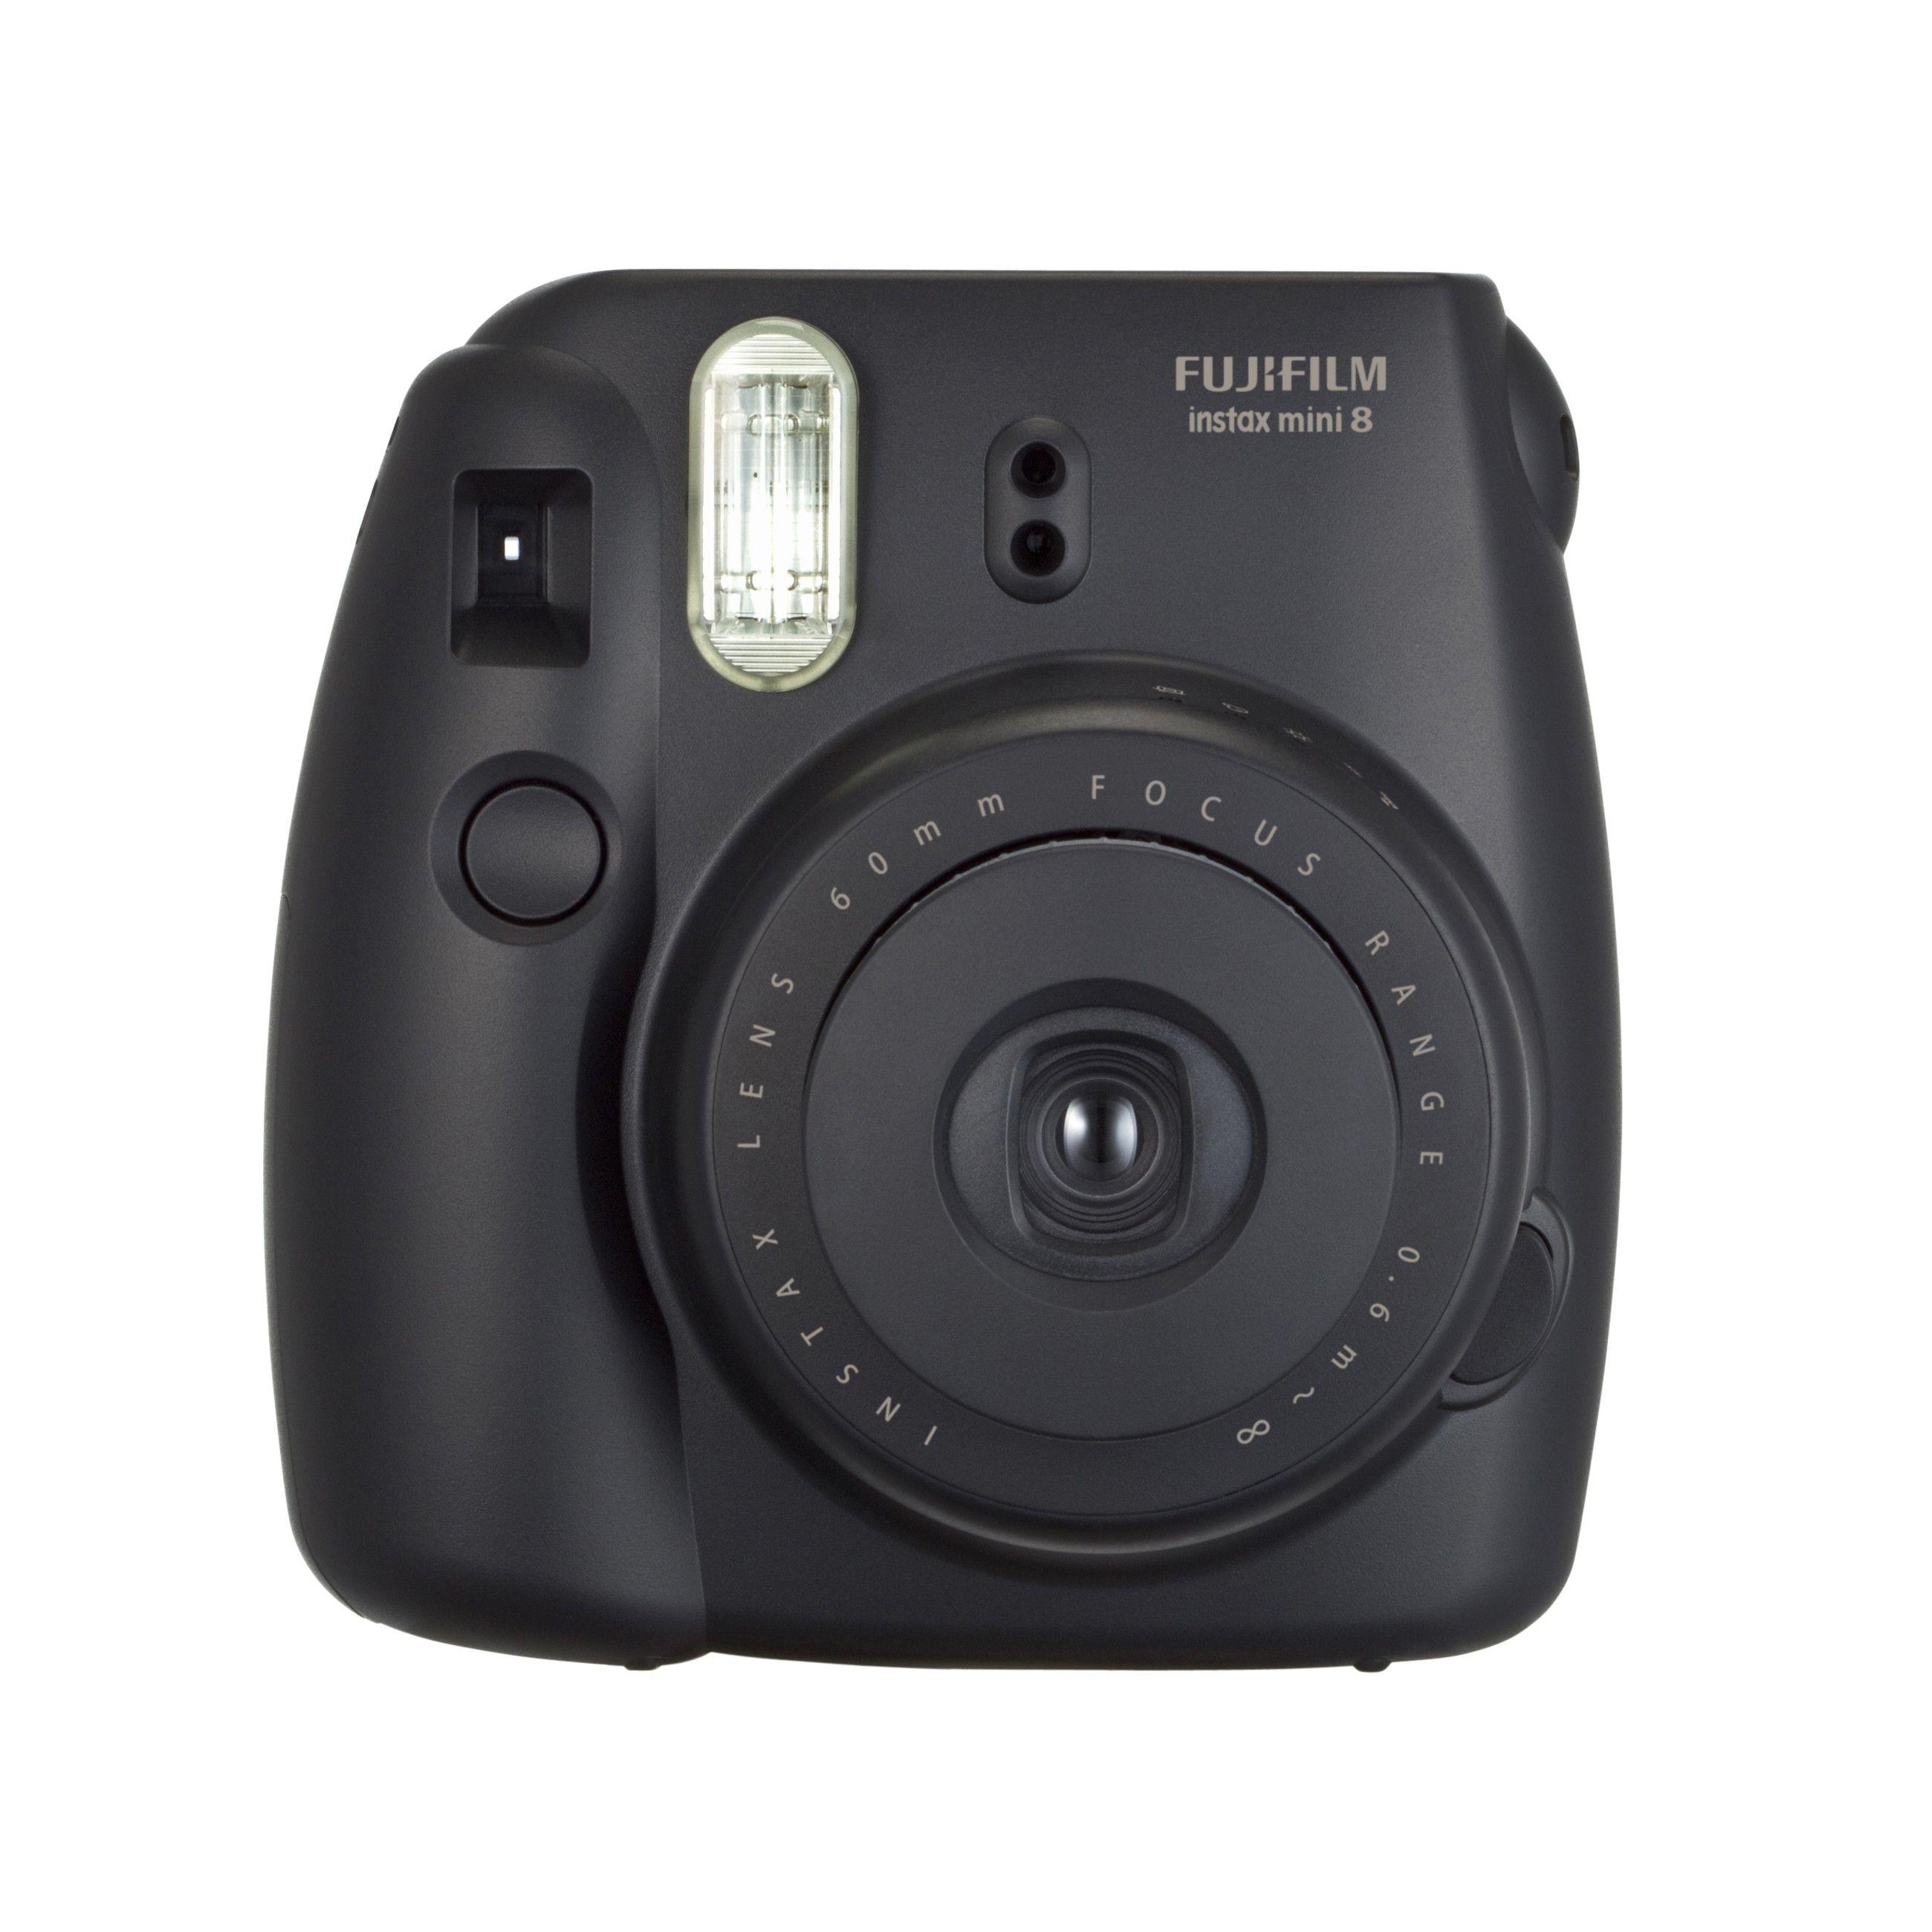 instax mini 8 instant camera noir   Boutique Fujifilm   photography ... 4b30df75e5b8